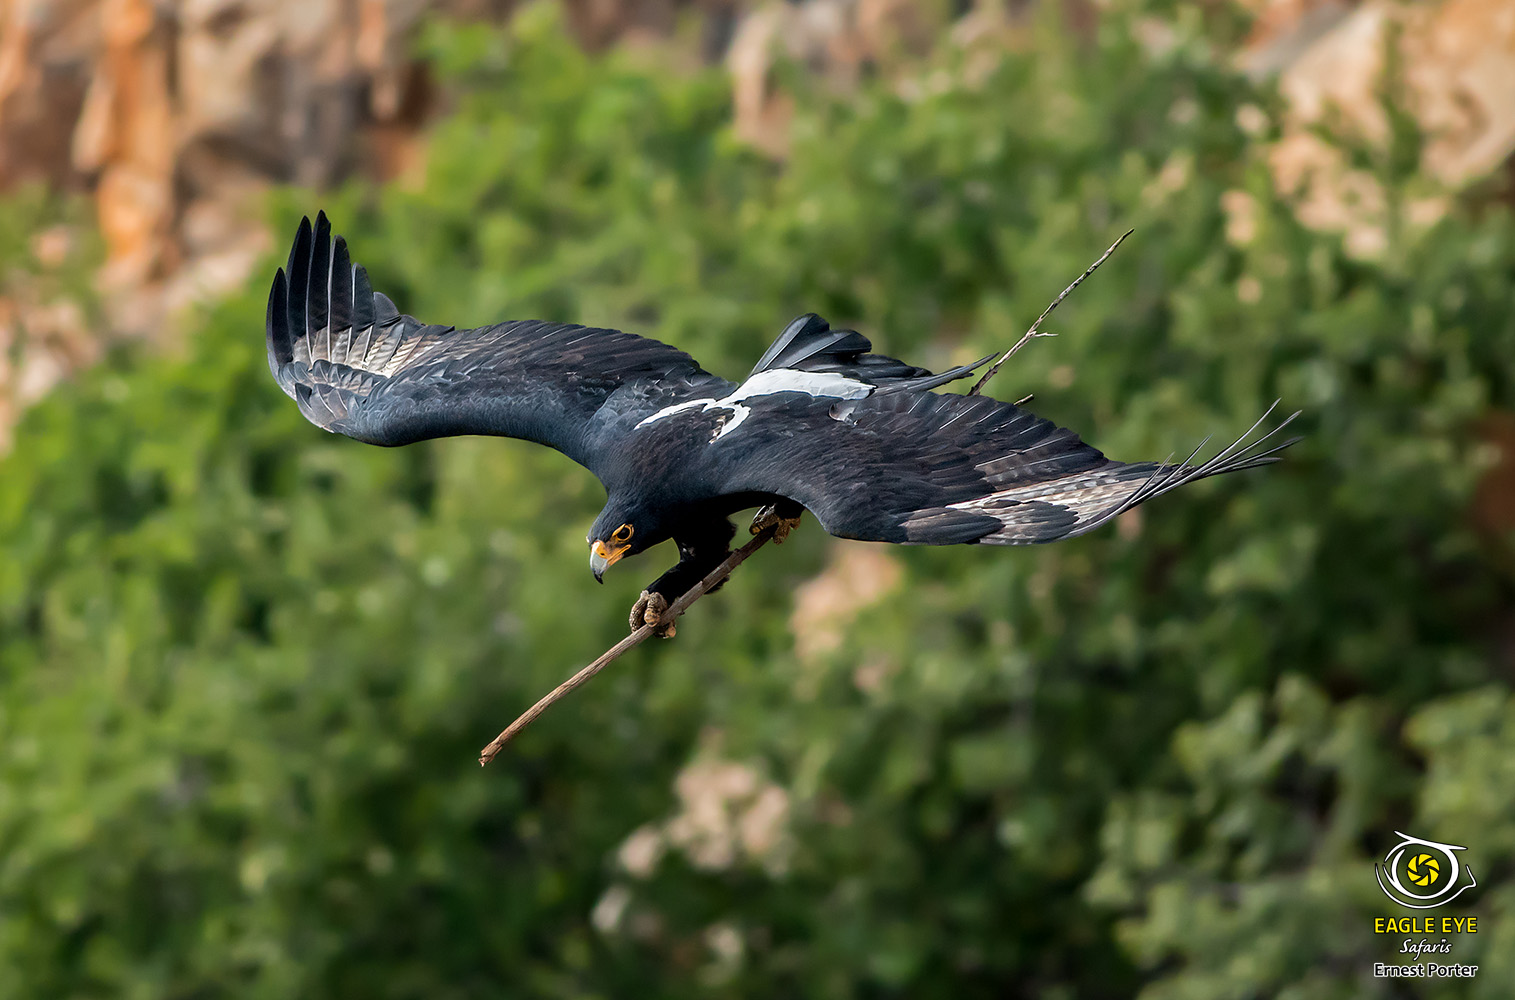 Emoyeni playing quidditch - Harry Potter (Verreaux's Eagle)